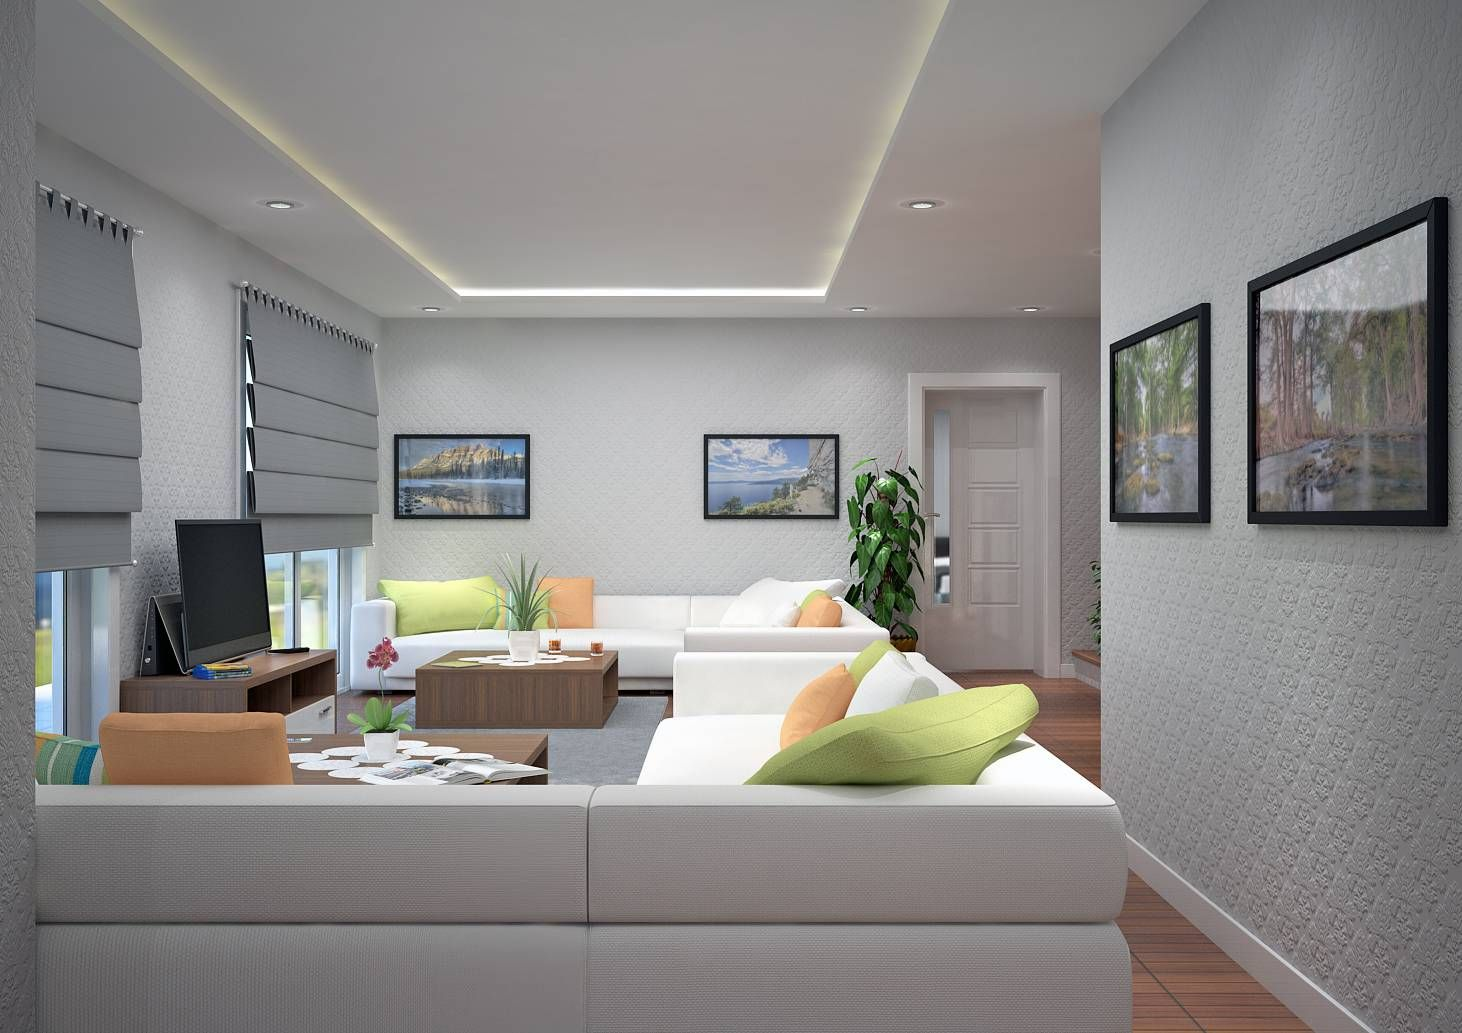 Maison moderne 150m2 Azur Logement Provencal | Modern home design ...